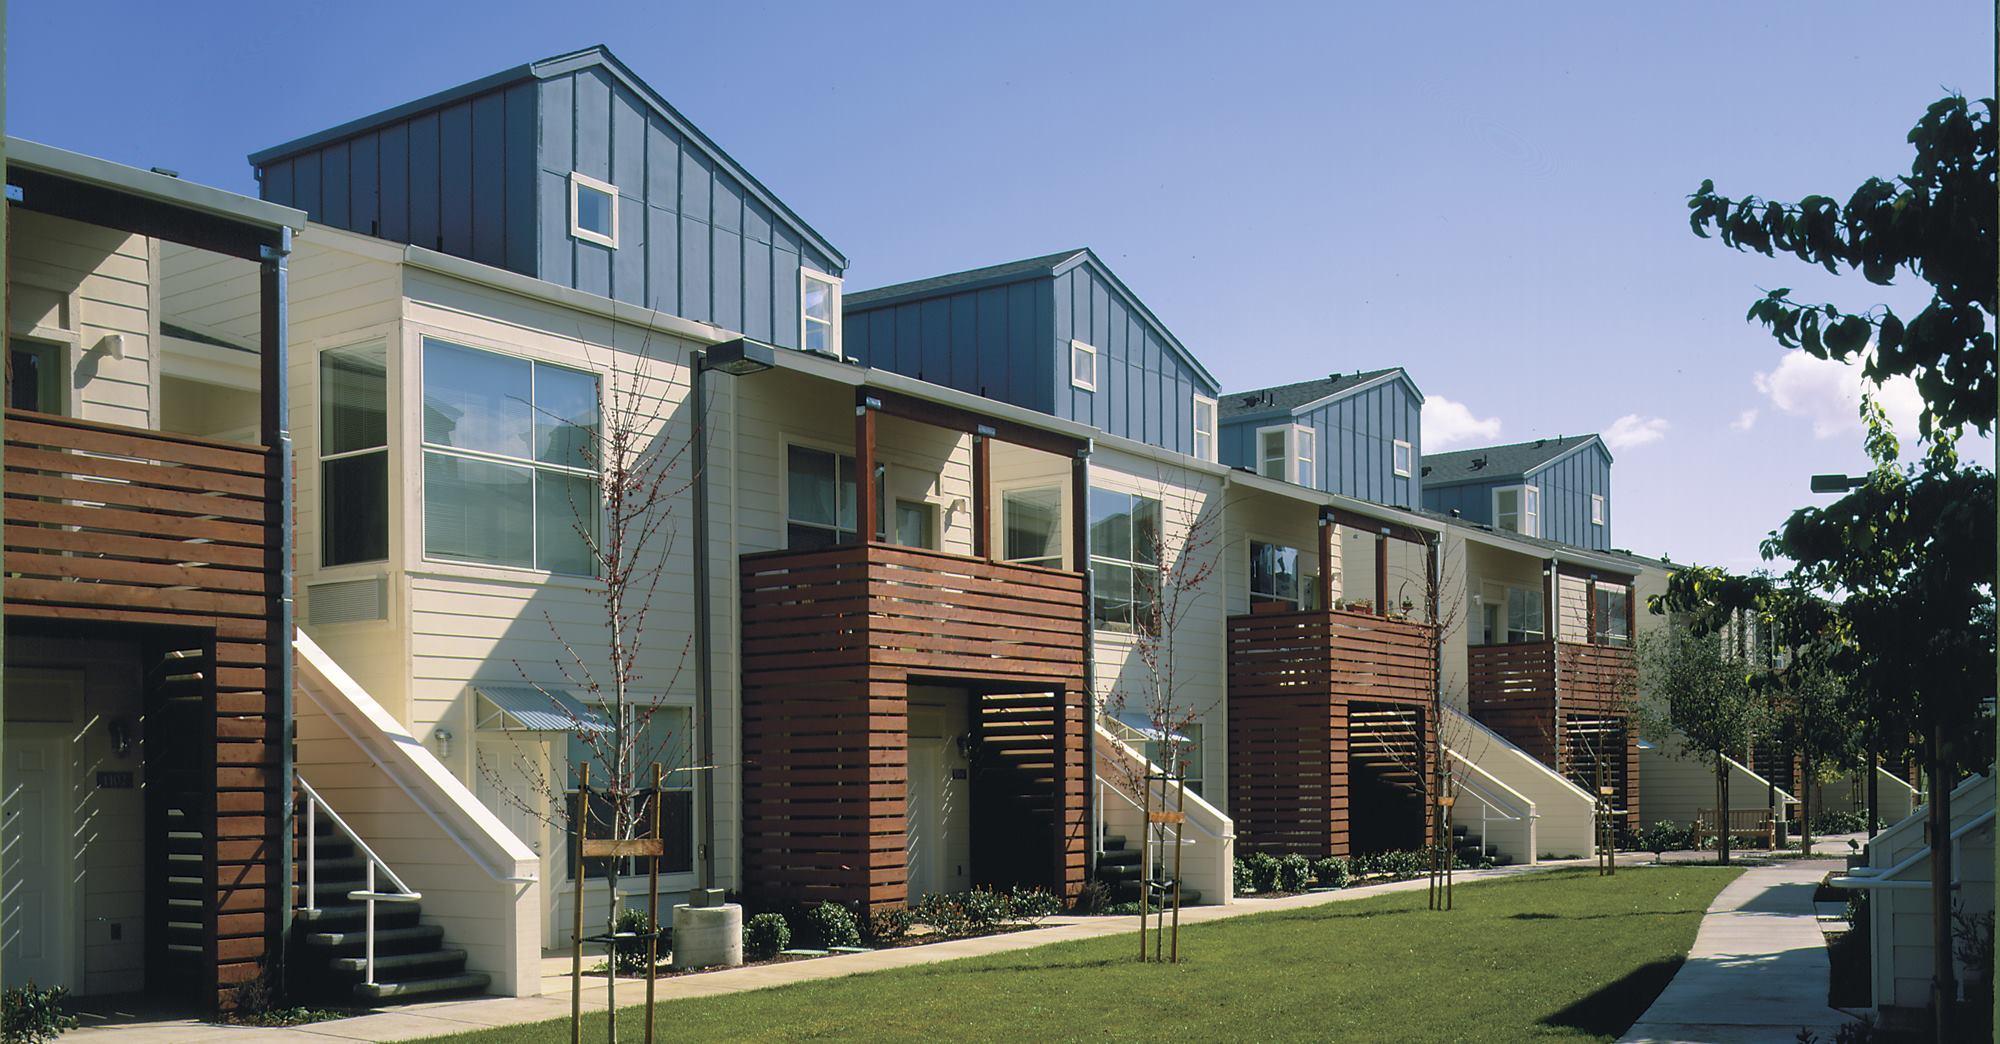 Montage palo alto calif residential architect for Residential architect design awards